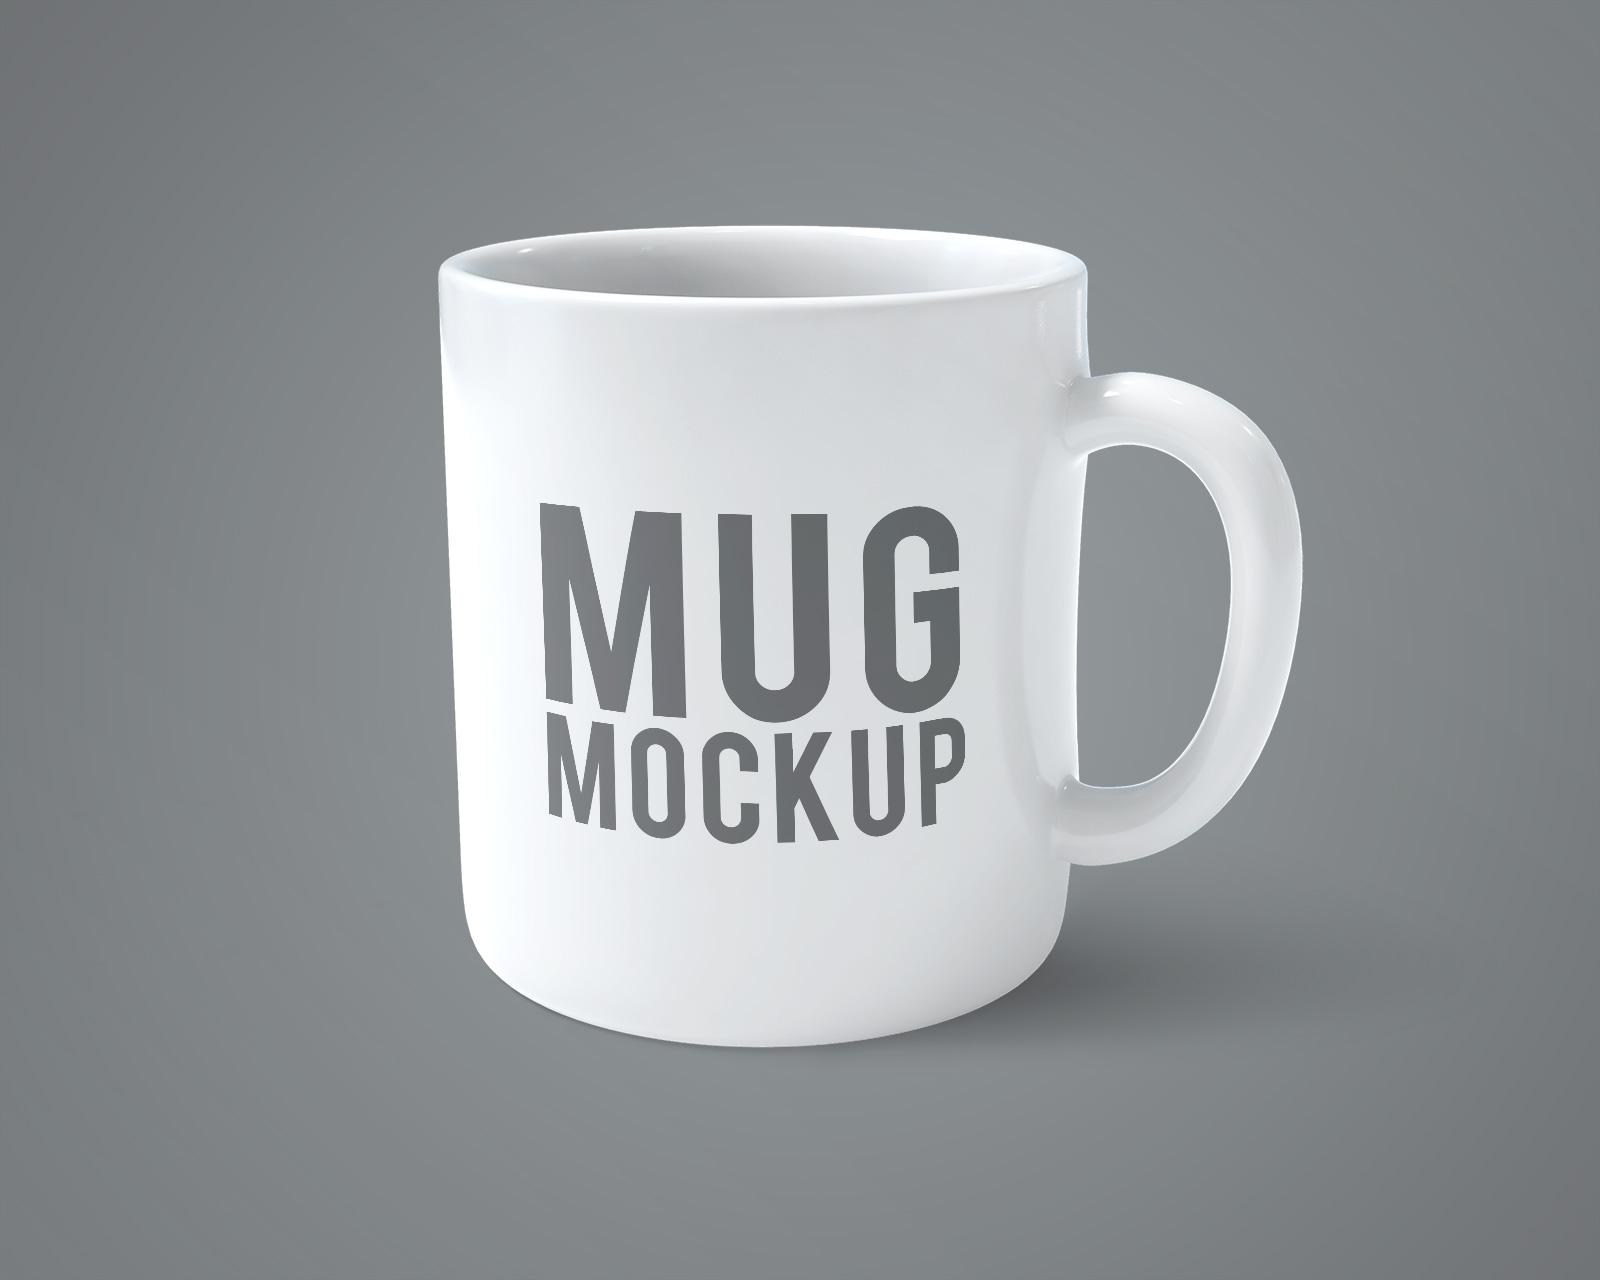 Free-Mug-Mockup-PSD-3